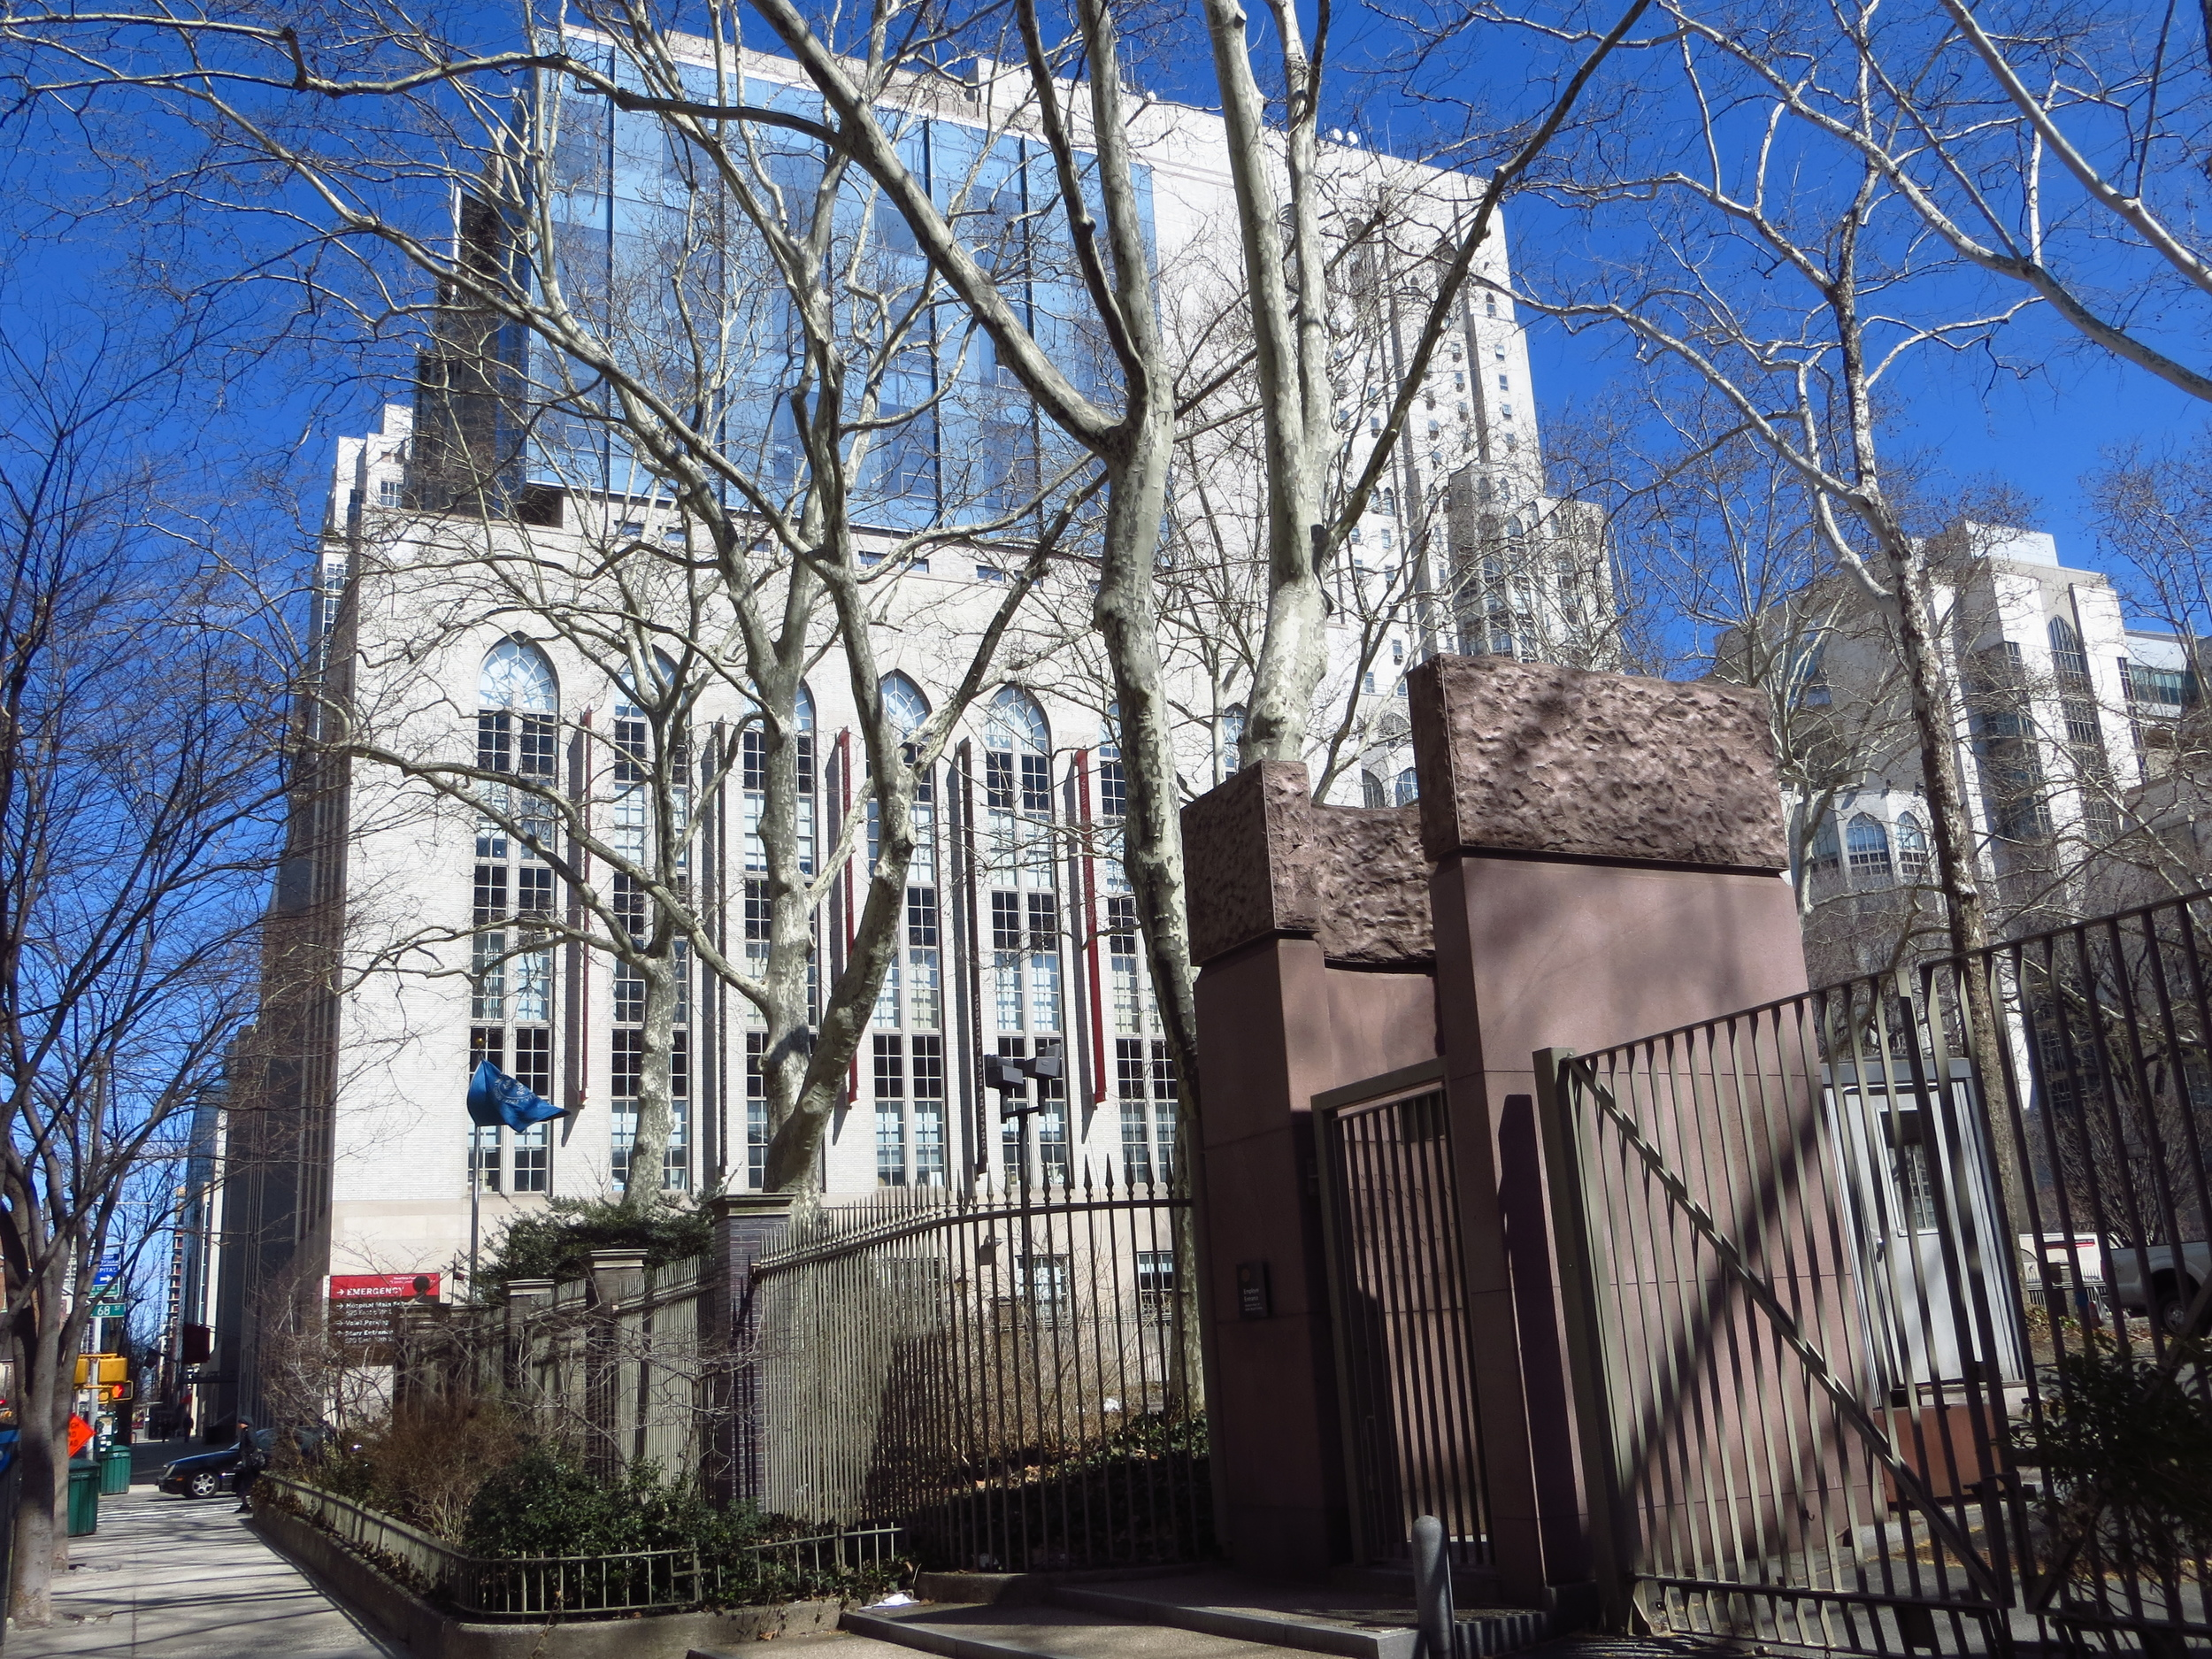 New York Cornell Presbyterian